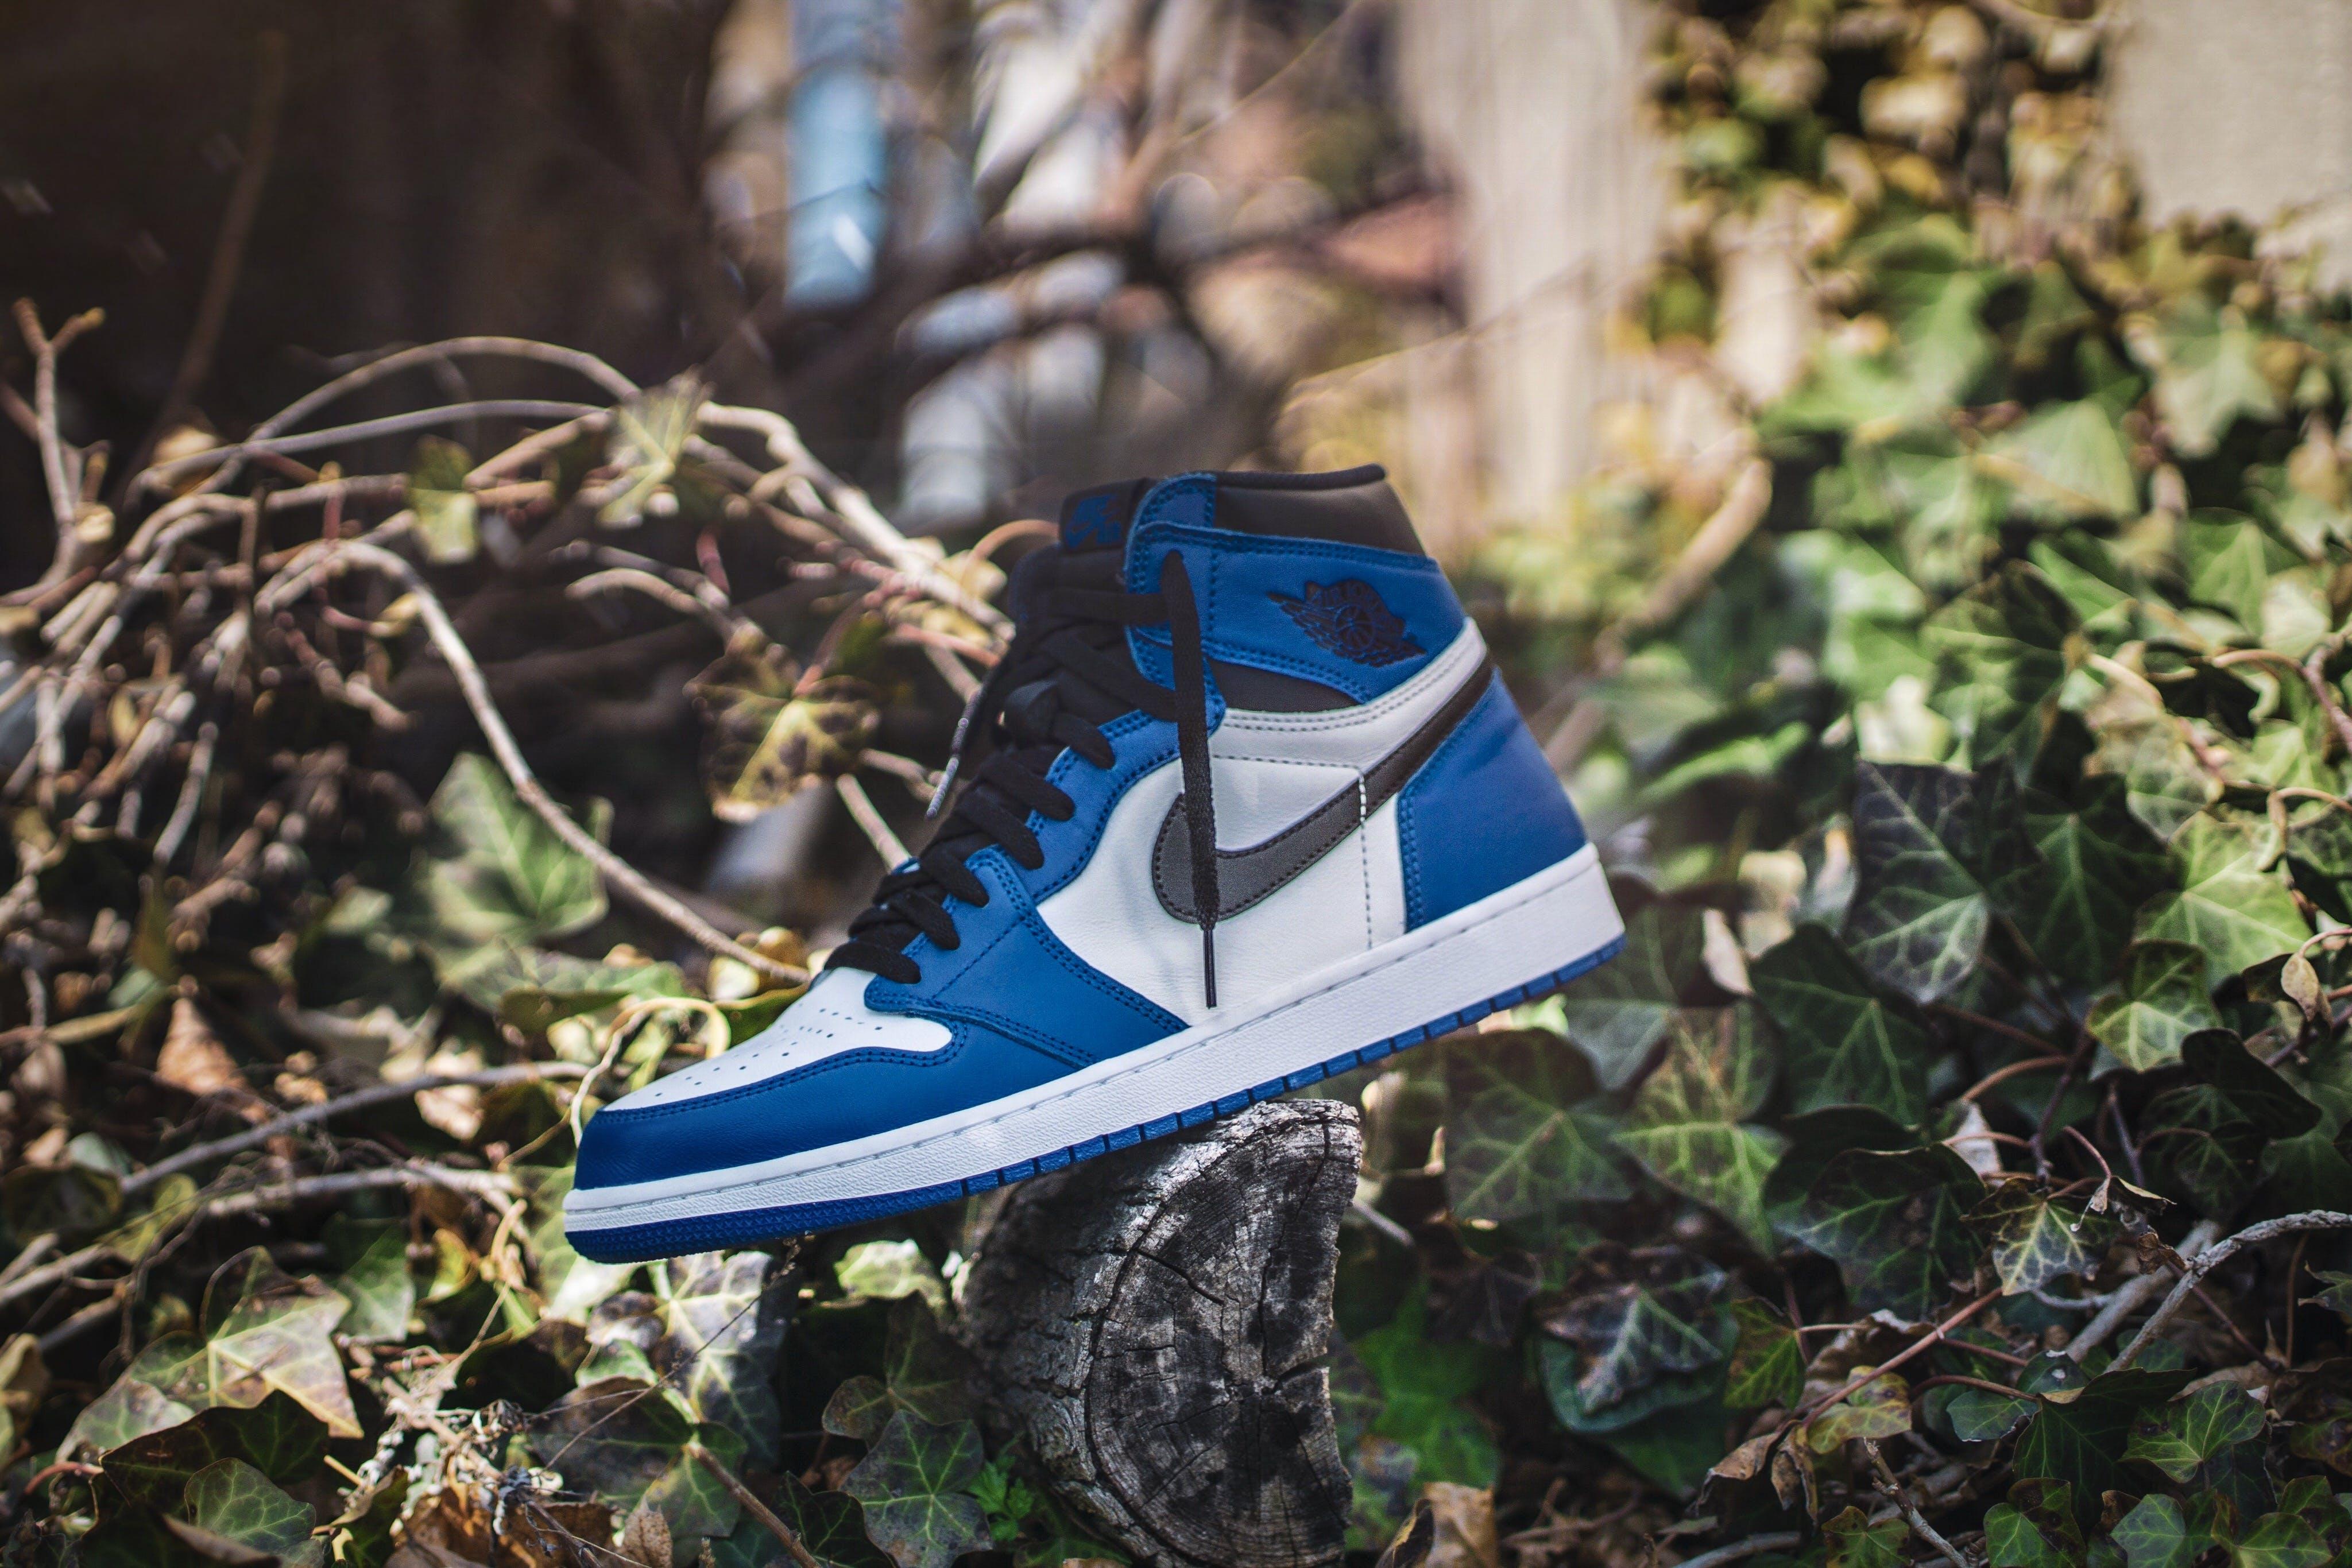 Blue and White Air Jordan 1 on Gray Wood Log at Daytime